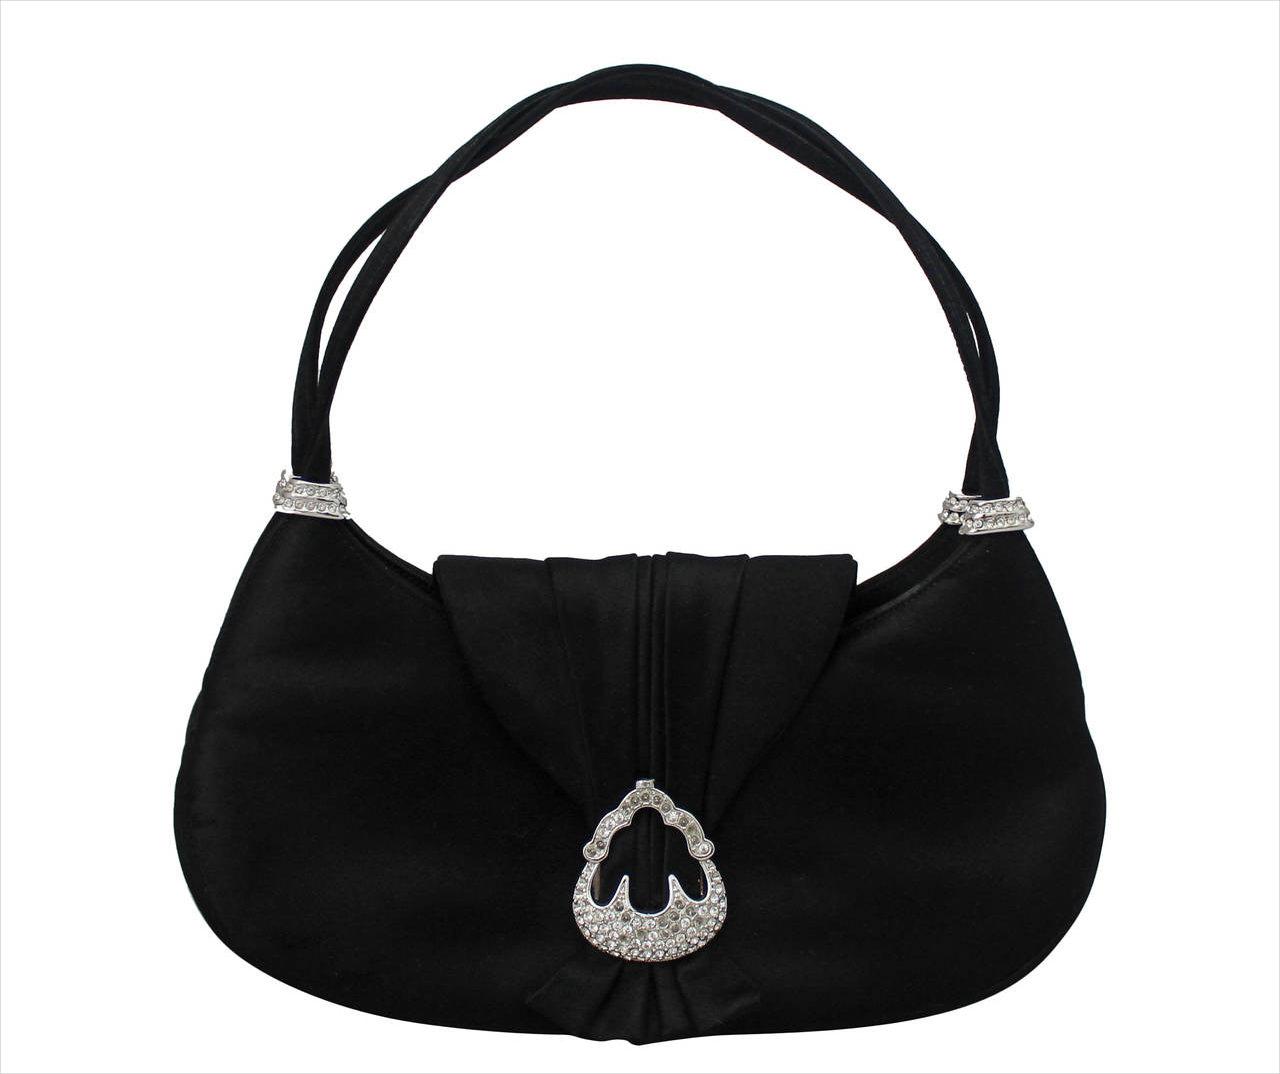 Judith Leiber Rhinestone Bag